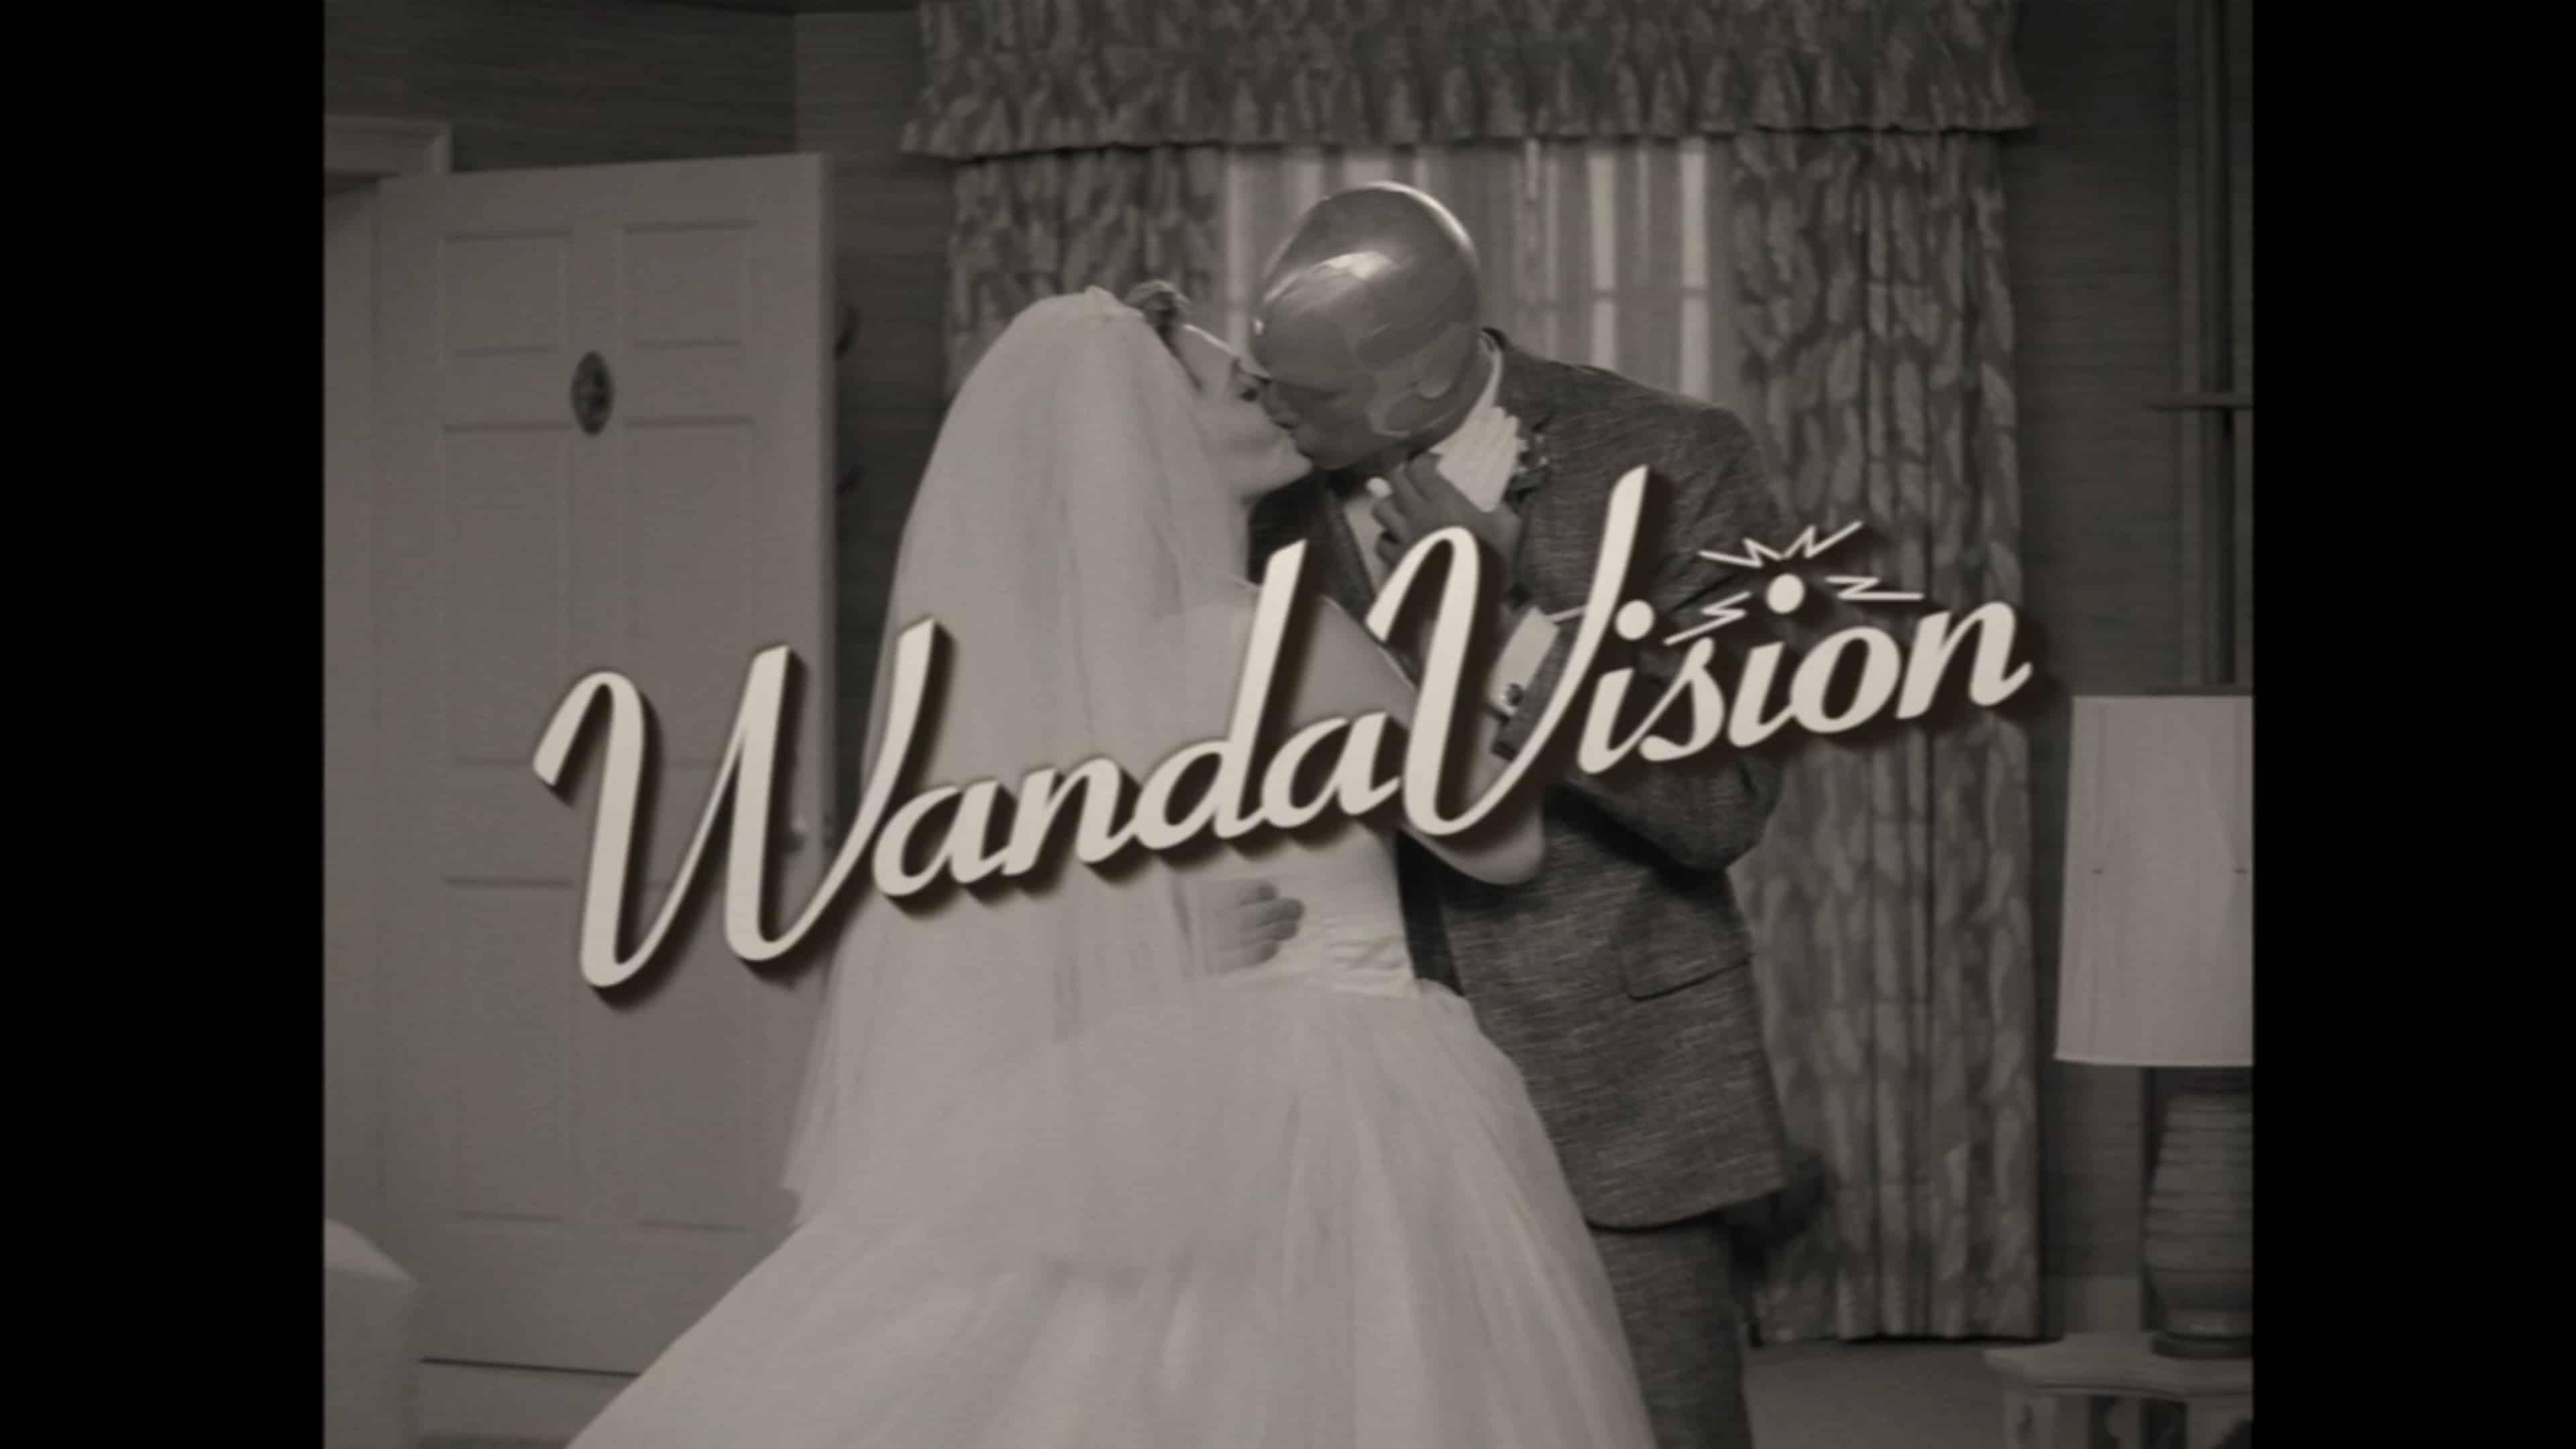 Title Card - Wandavision Season 1 Episode 1 [Series Premiere] | Featuring Wanda and Vision kissing